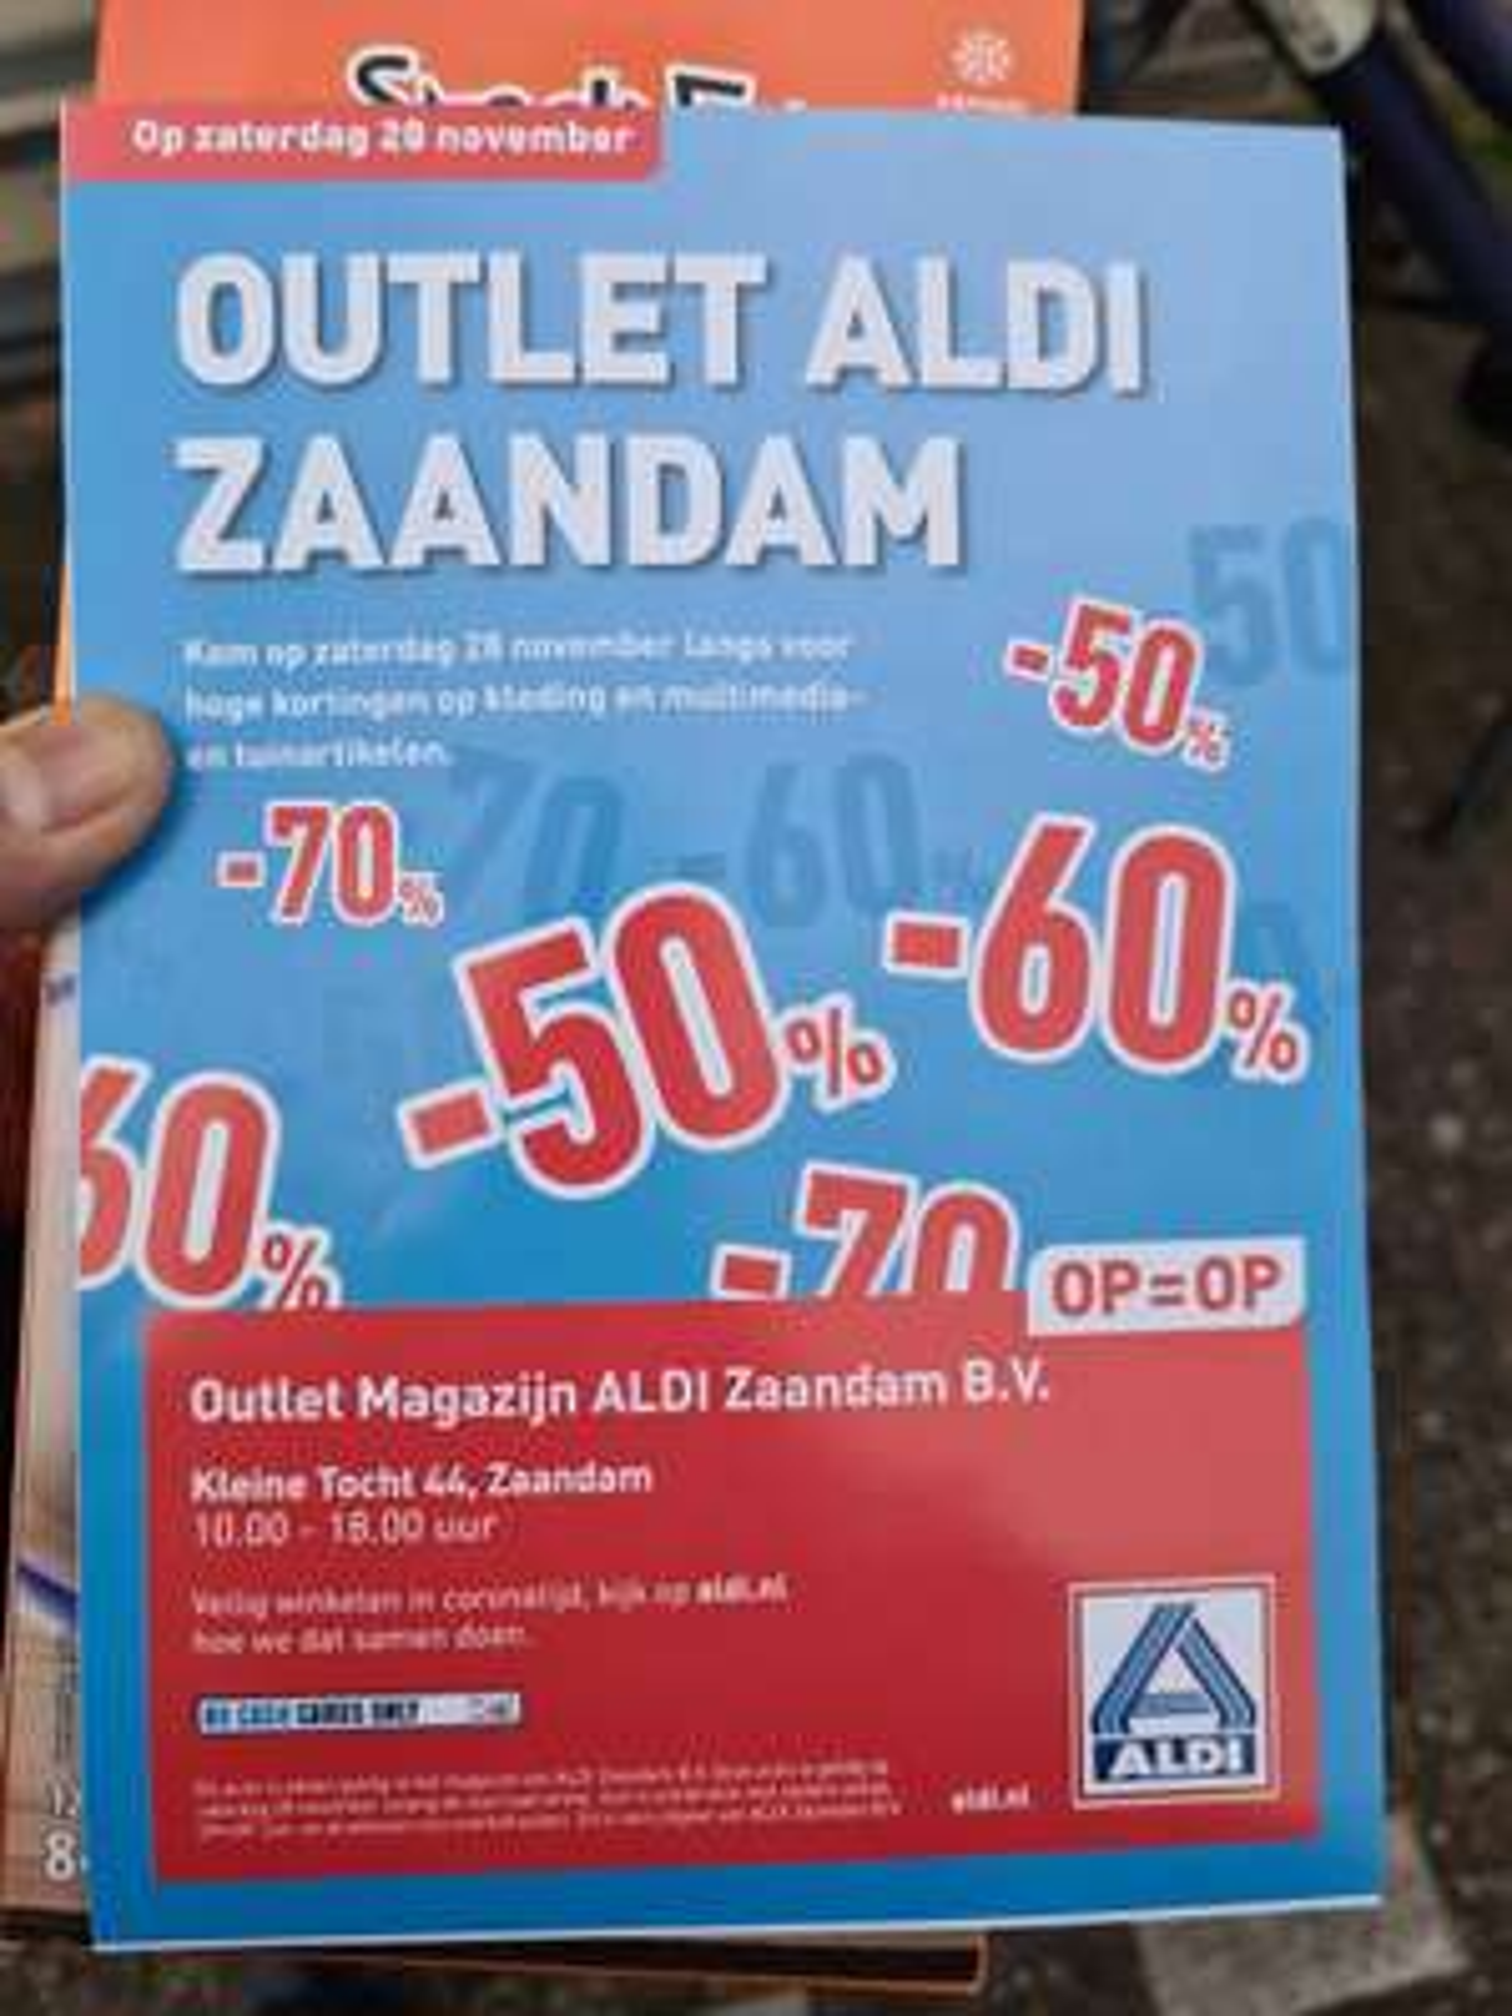 Aldi outlet Zaandam tot 70% Korting